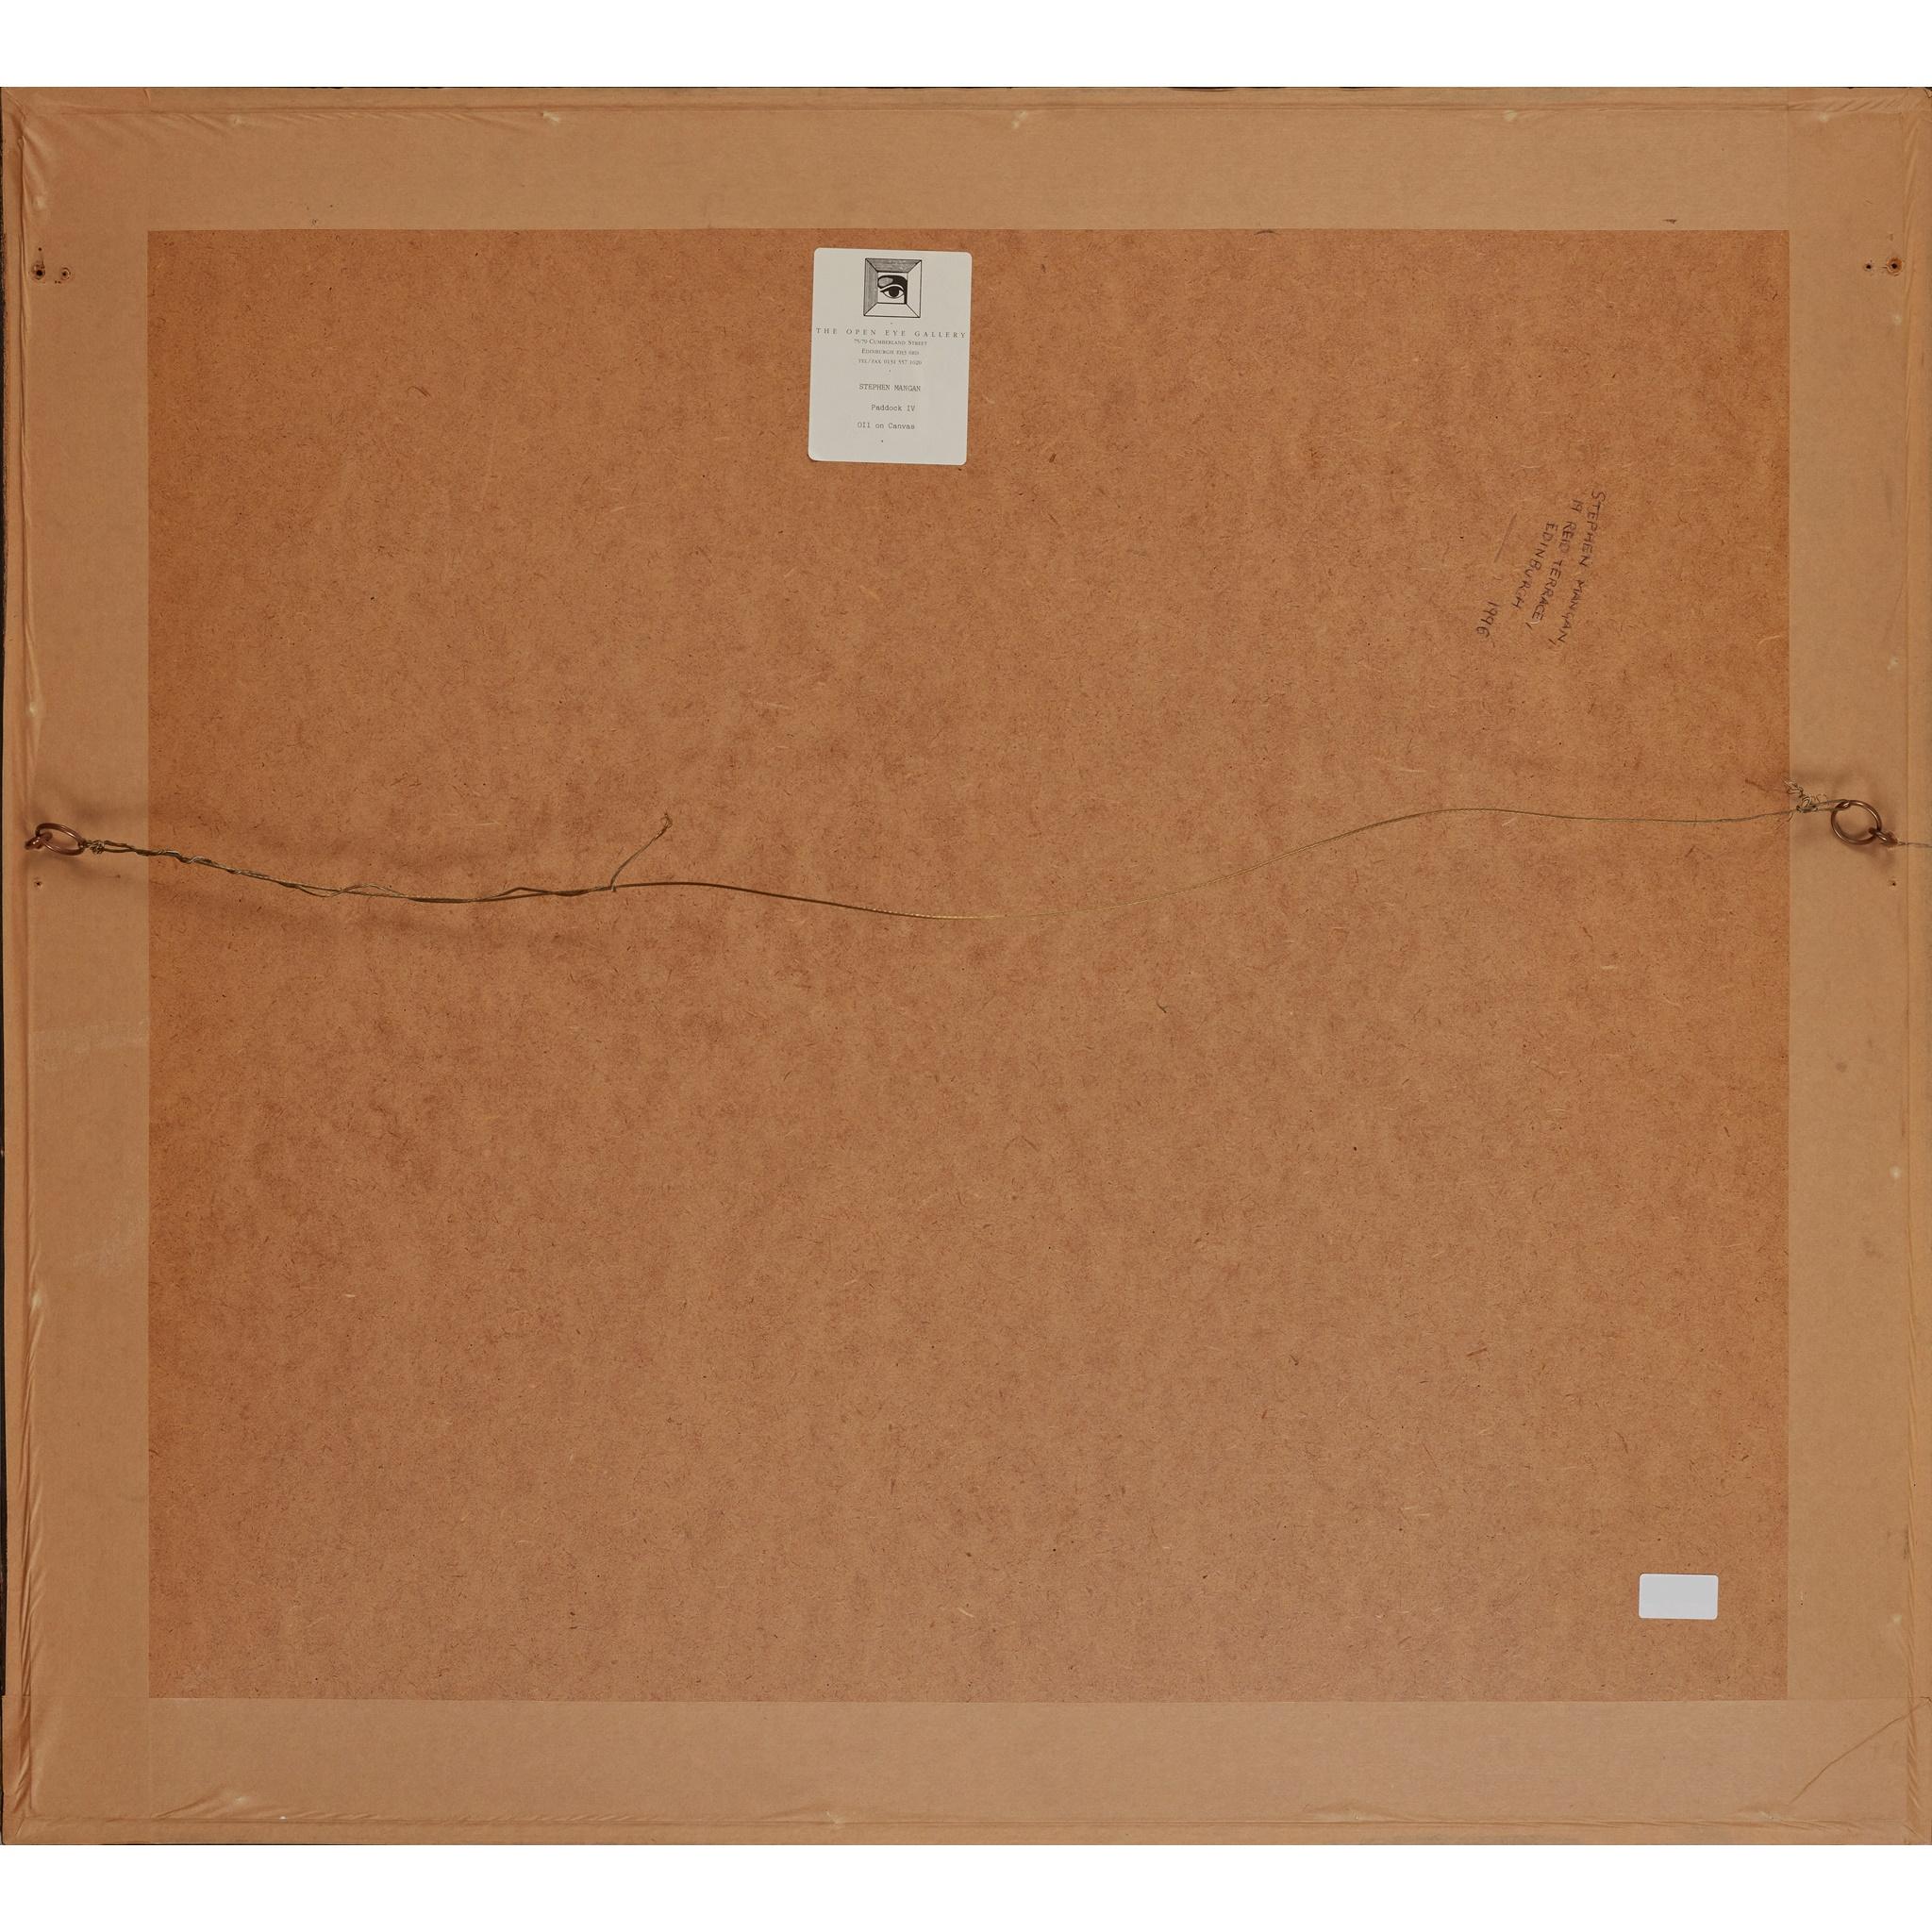 § STEPHEN MANGAN (SCOTTISH 1964-) PADDOCK IV - Image 3 of 3